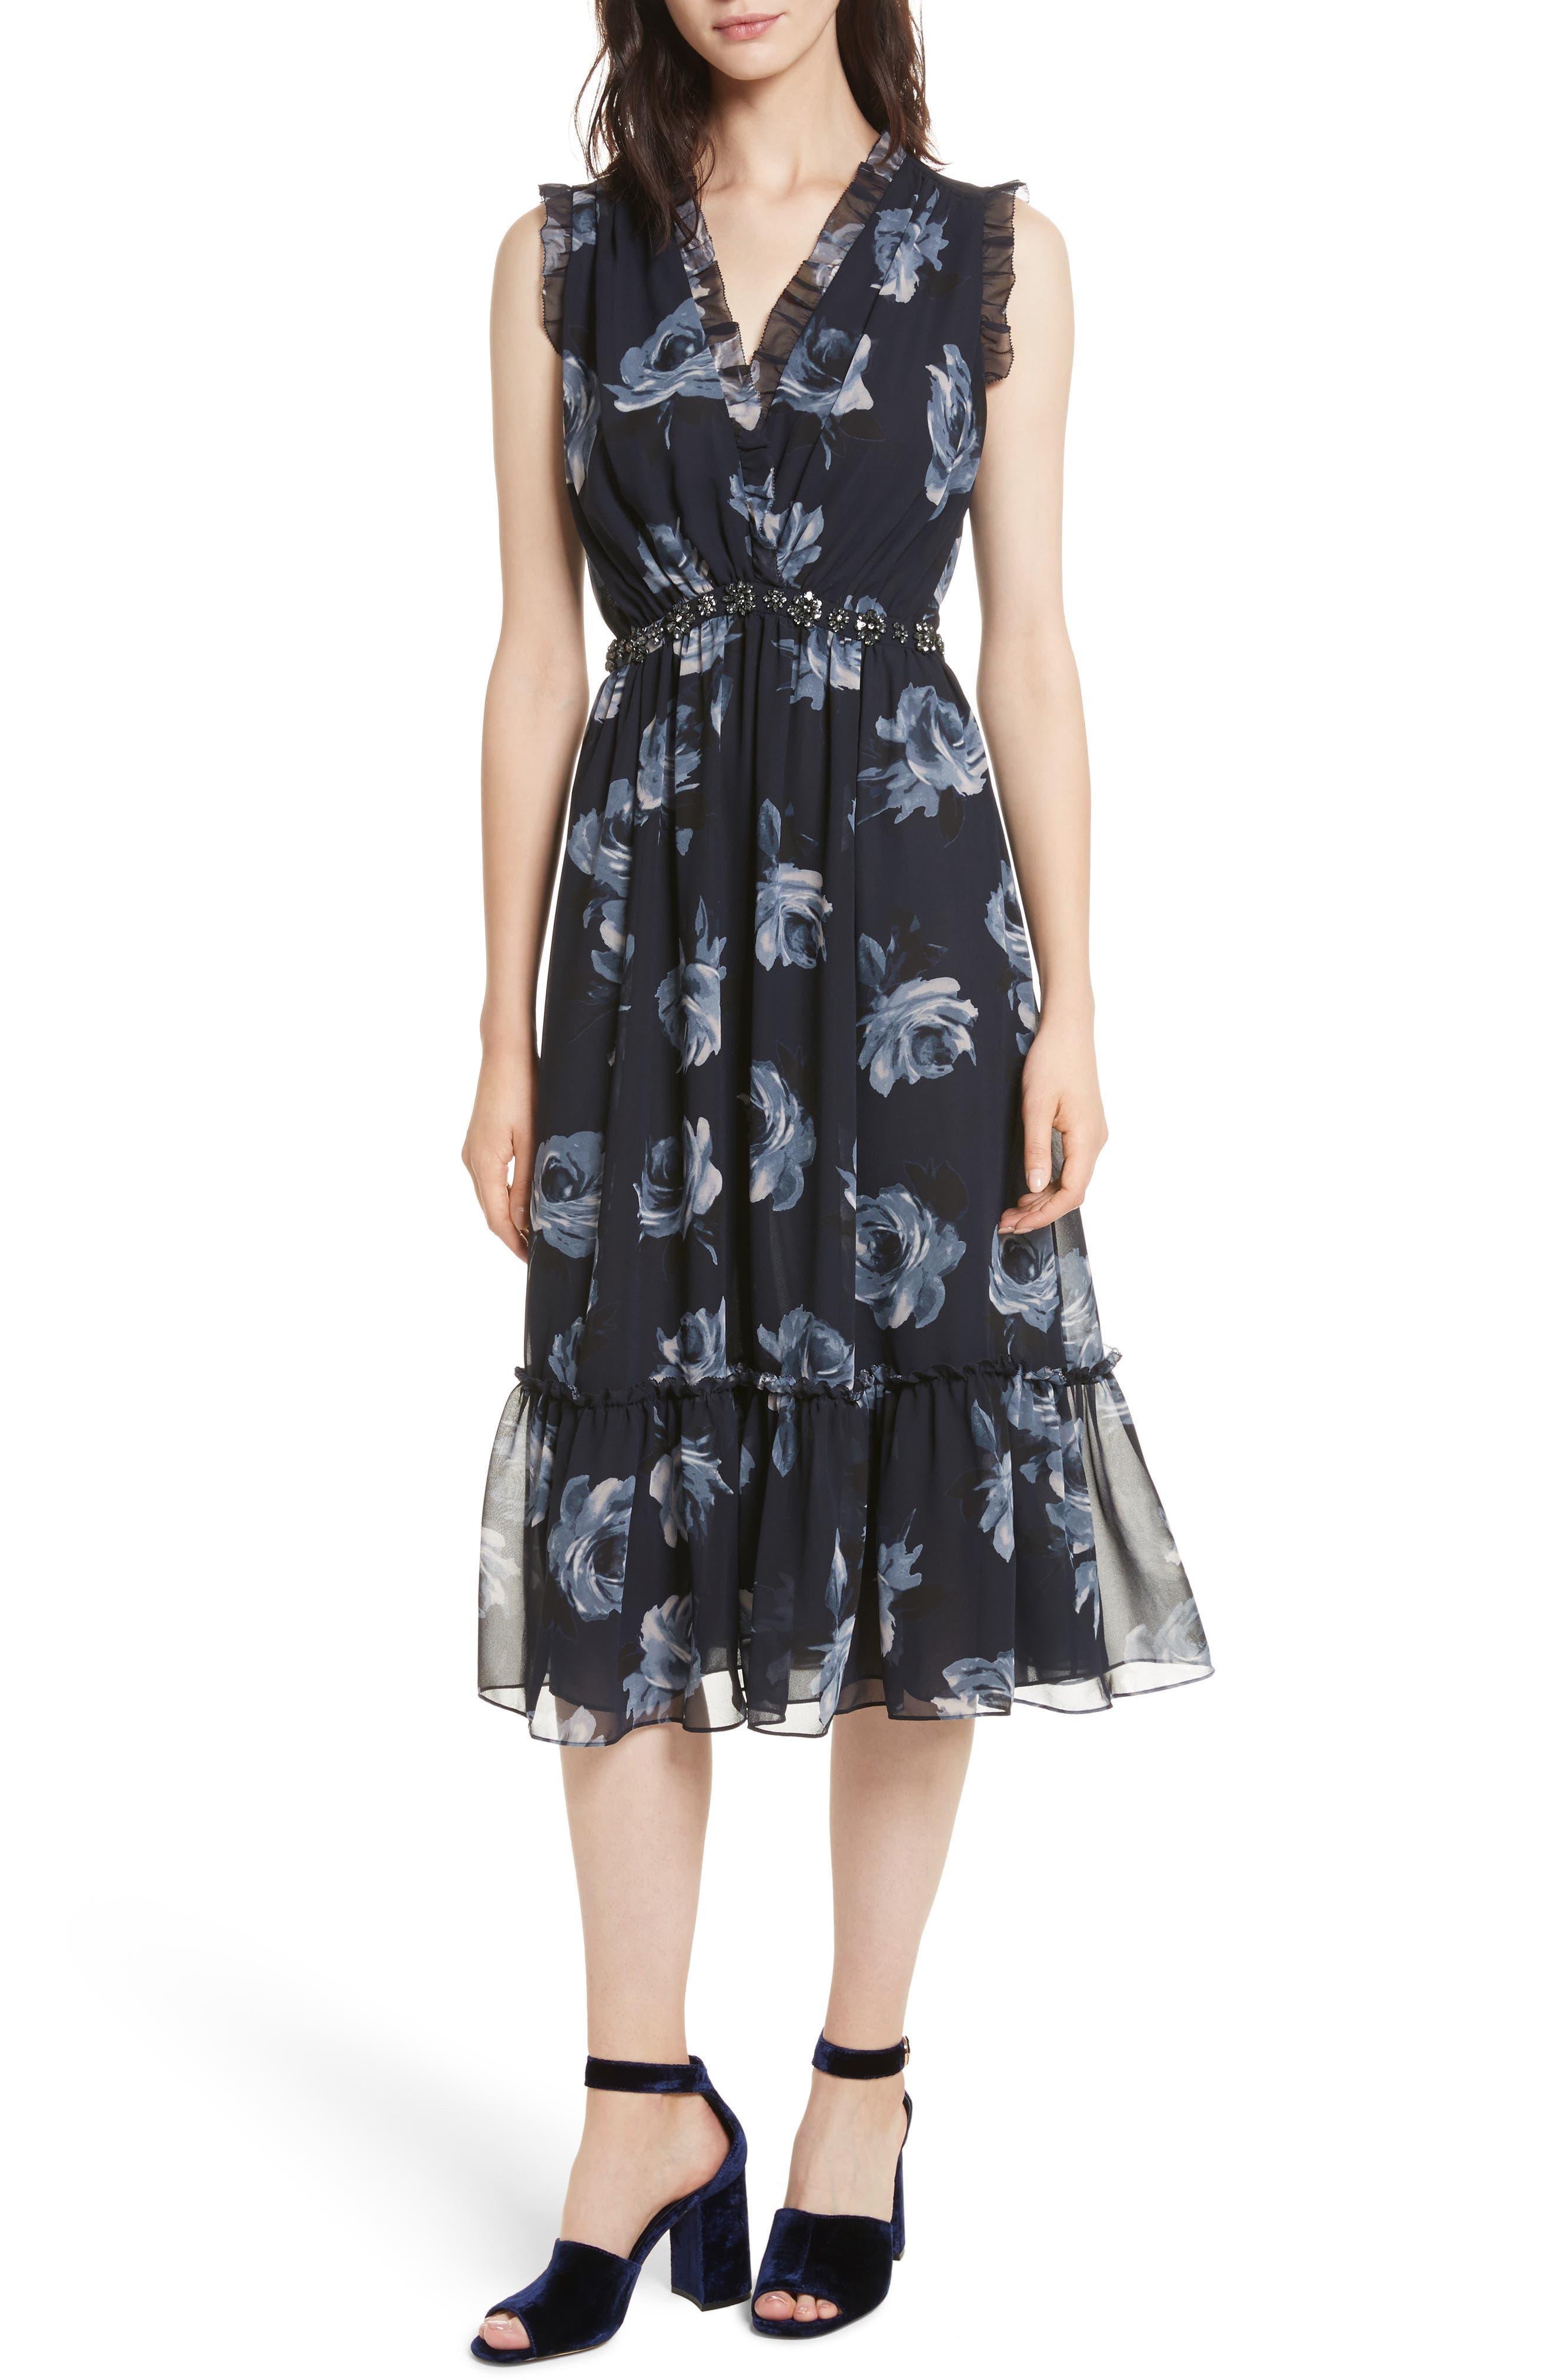 kade spade new york Night Rose Chiffon Midi Dress,                             Main thumbnail 1, color,                             Rich Navy